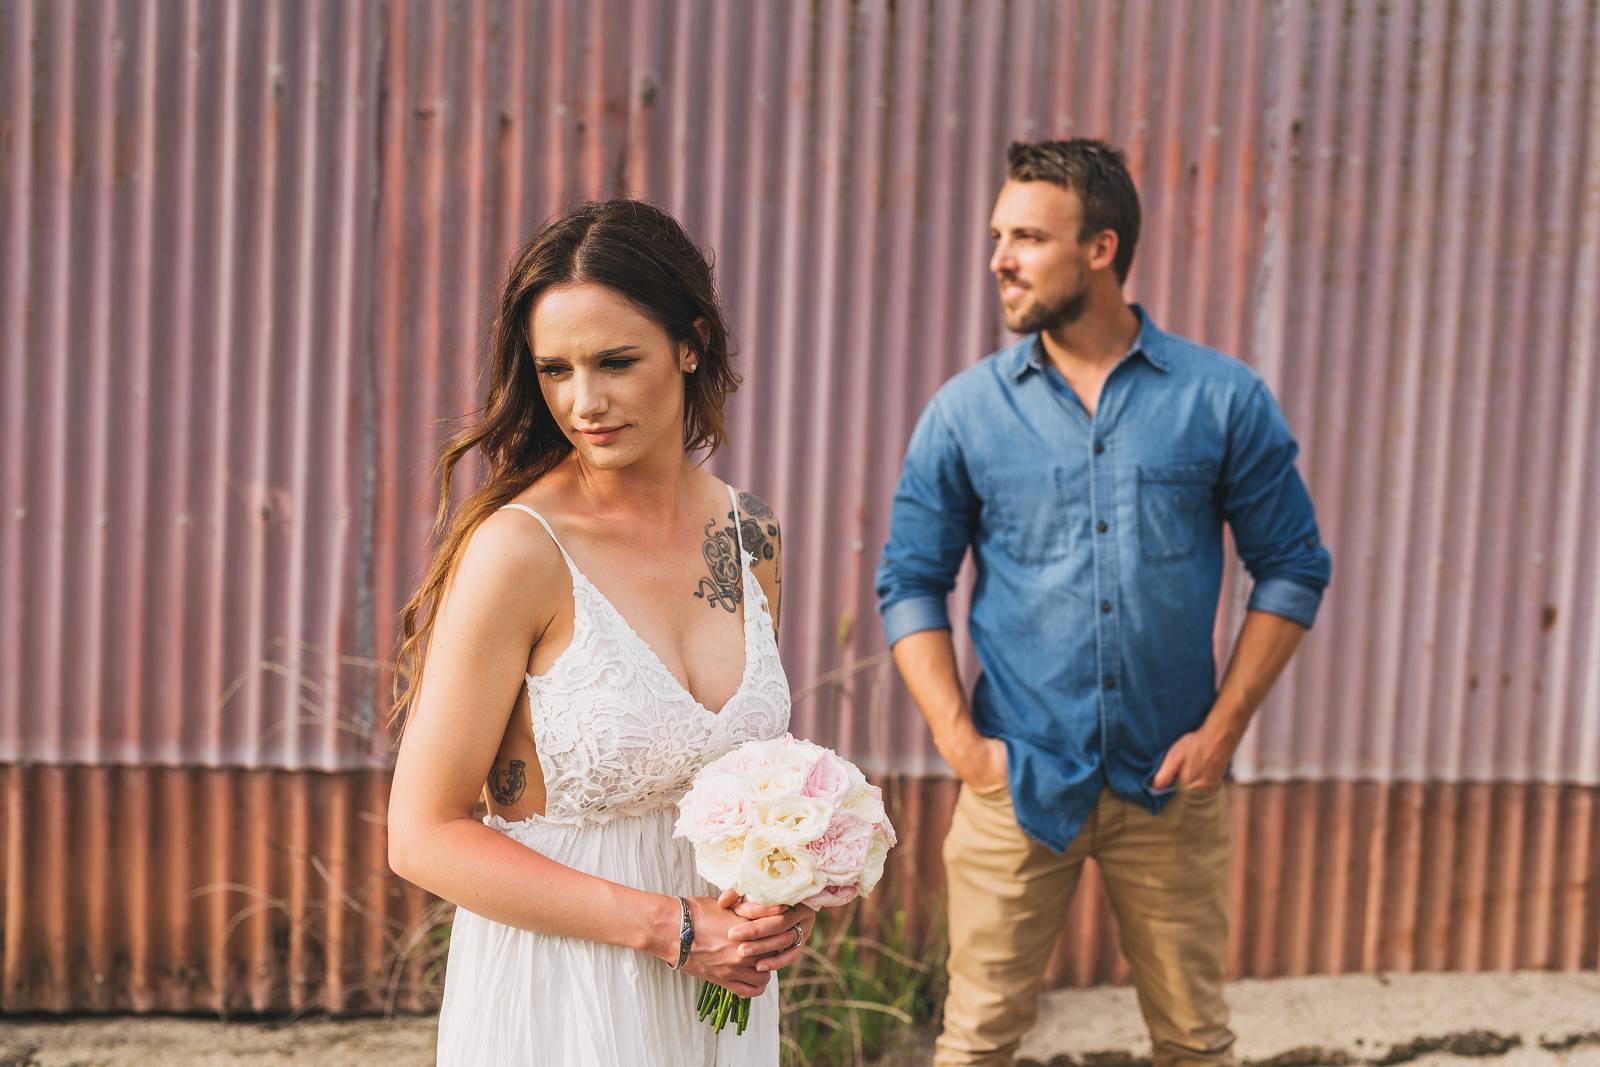 Newell Beach Wedding Photography